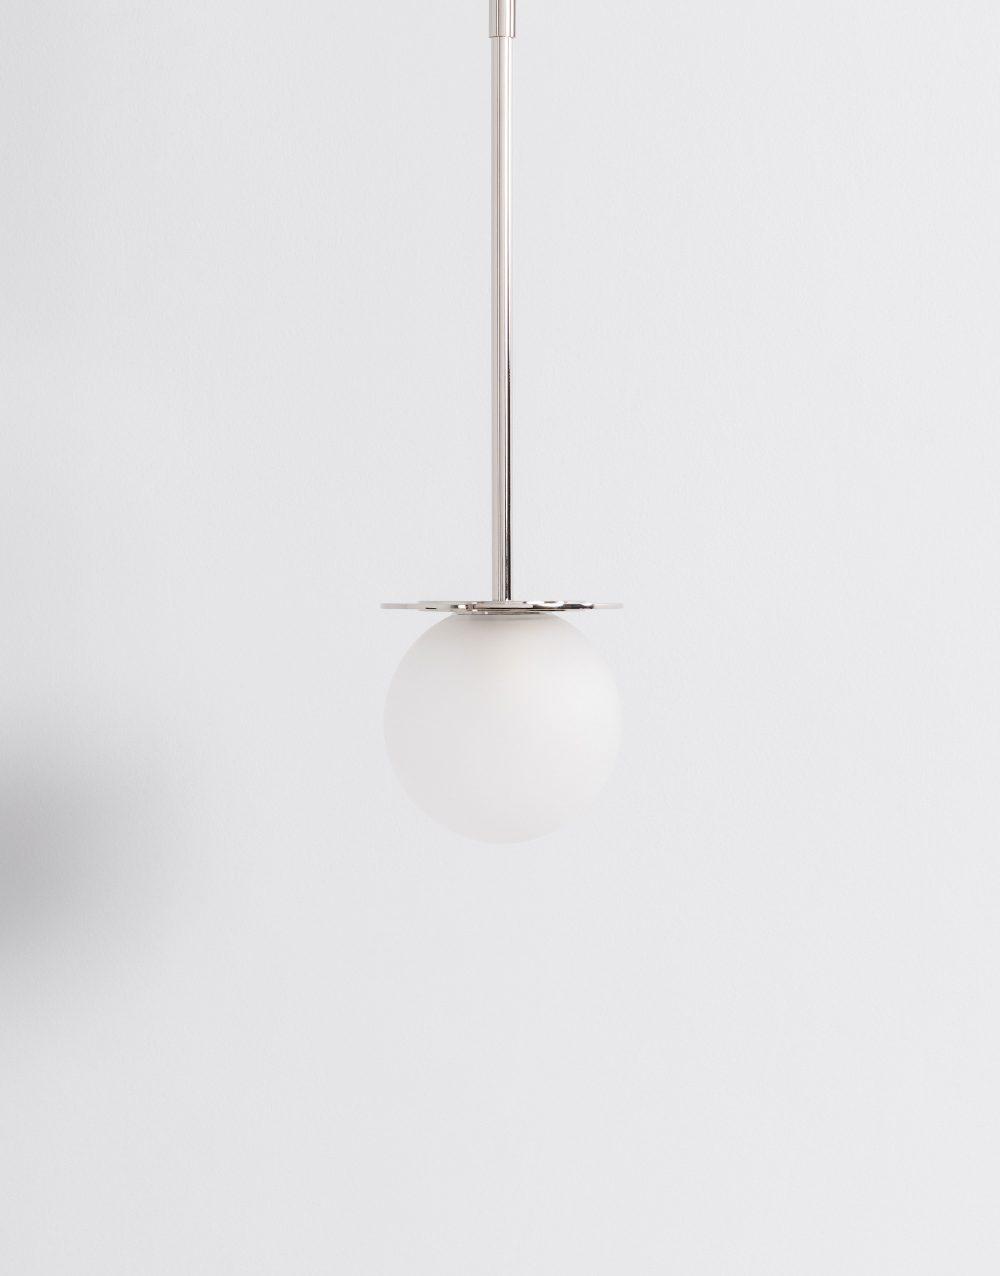 Kew Drop Light